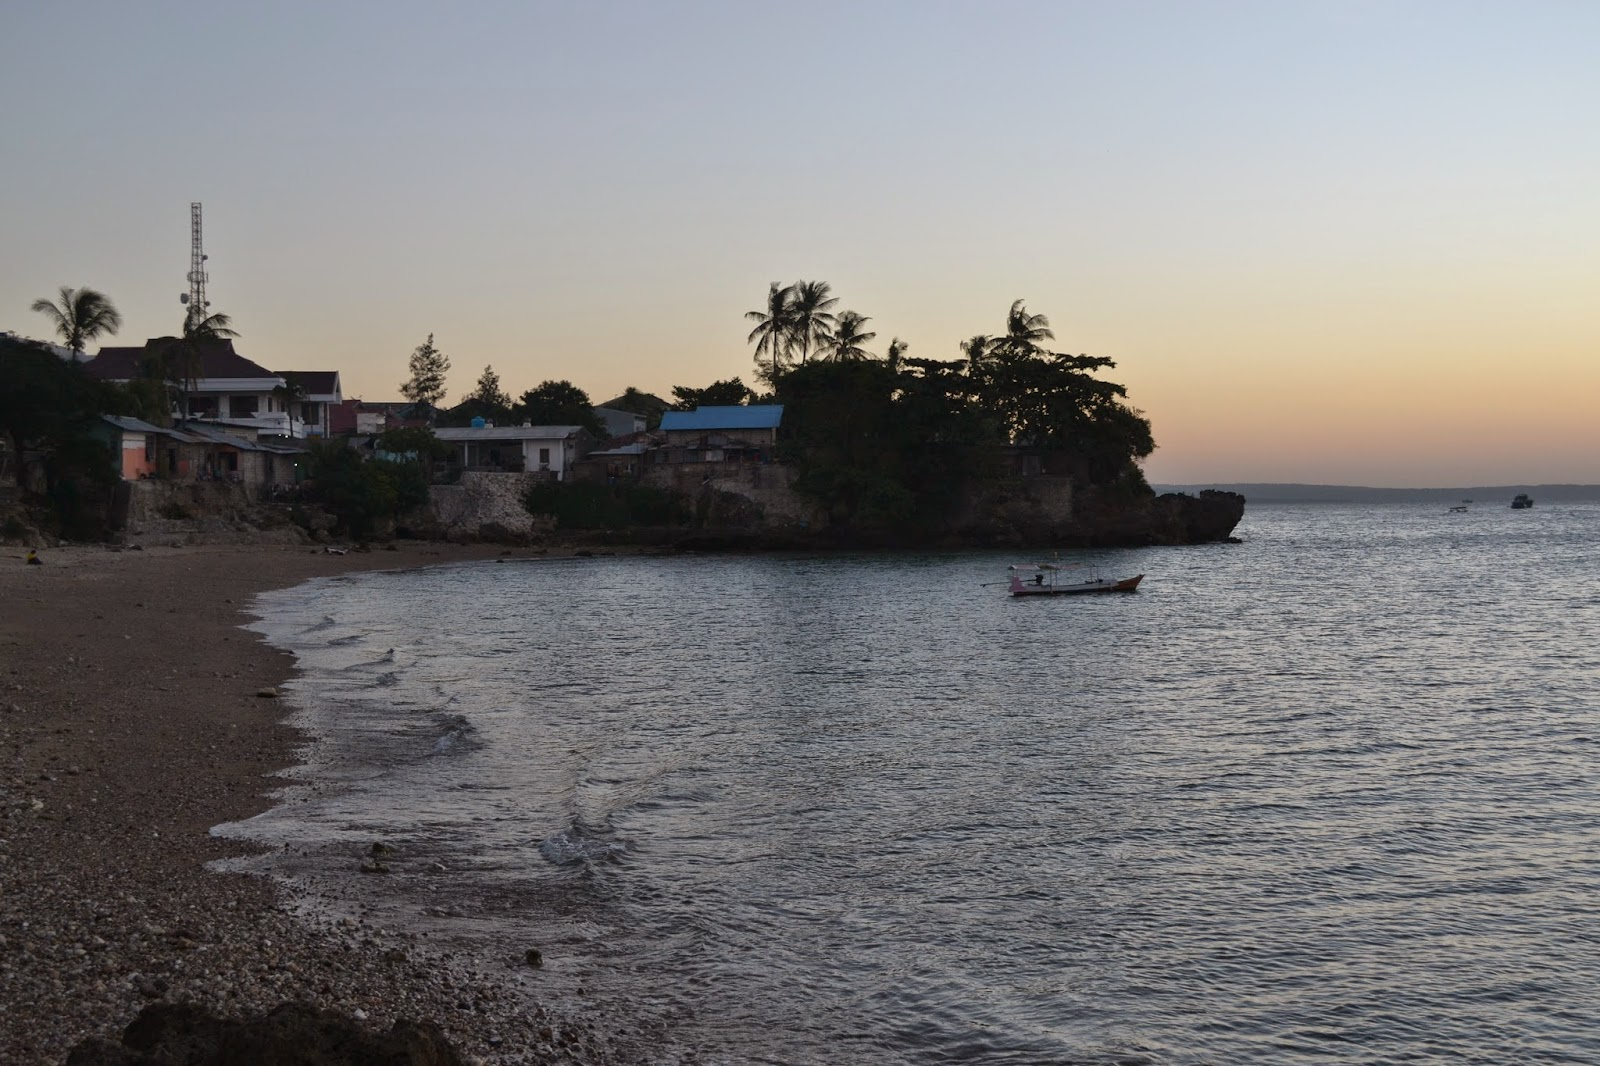 Pariwisata Nusa Tenggara Timur Ntt Katapang Satu Kupang Tempat Nongkrong